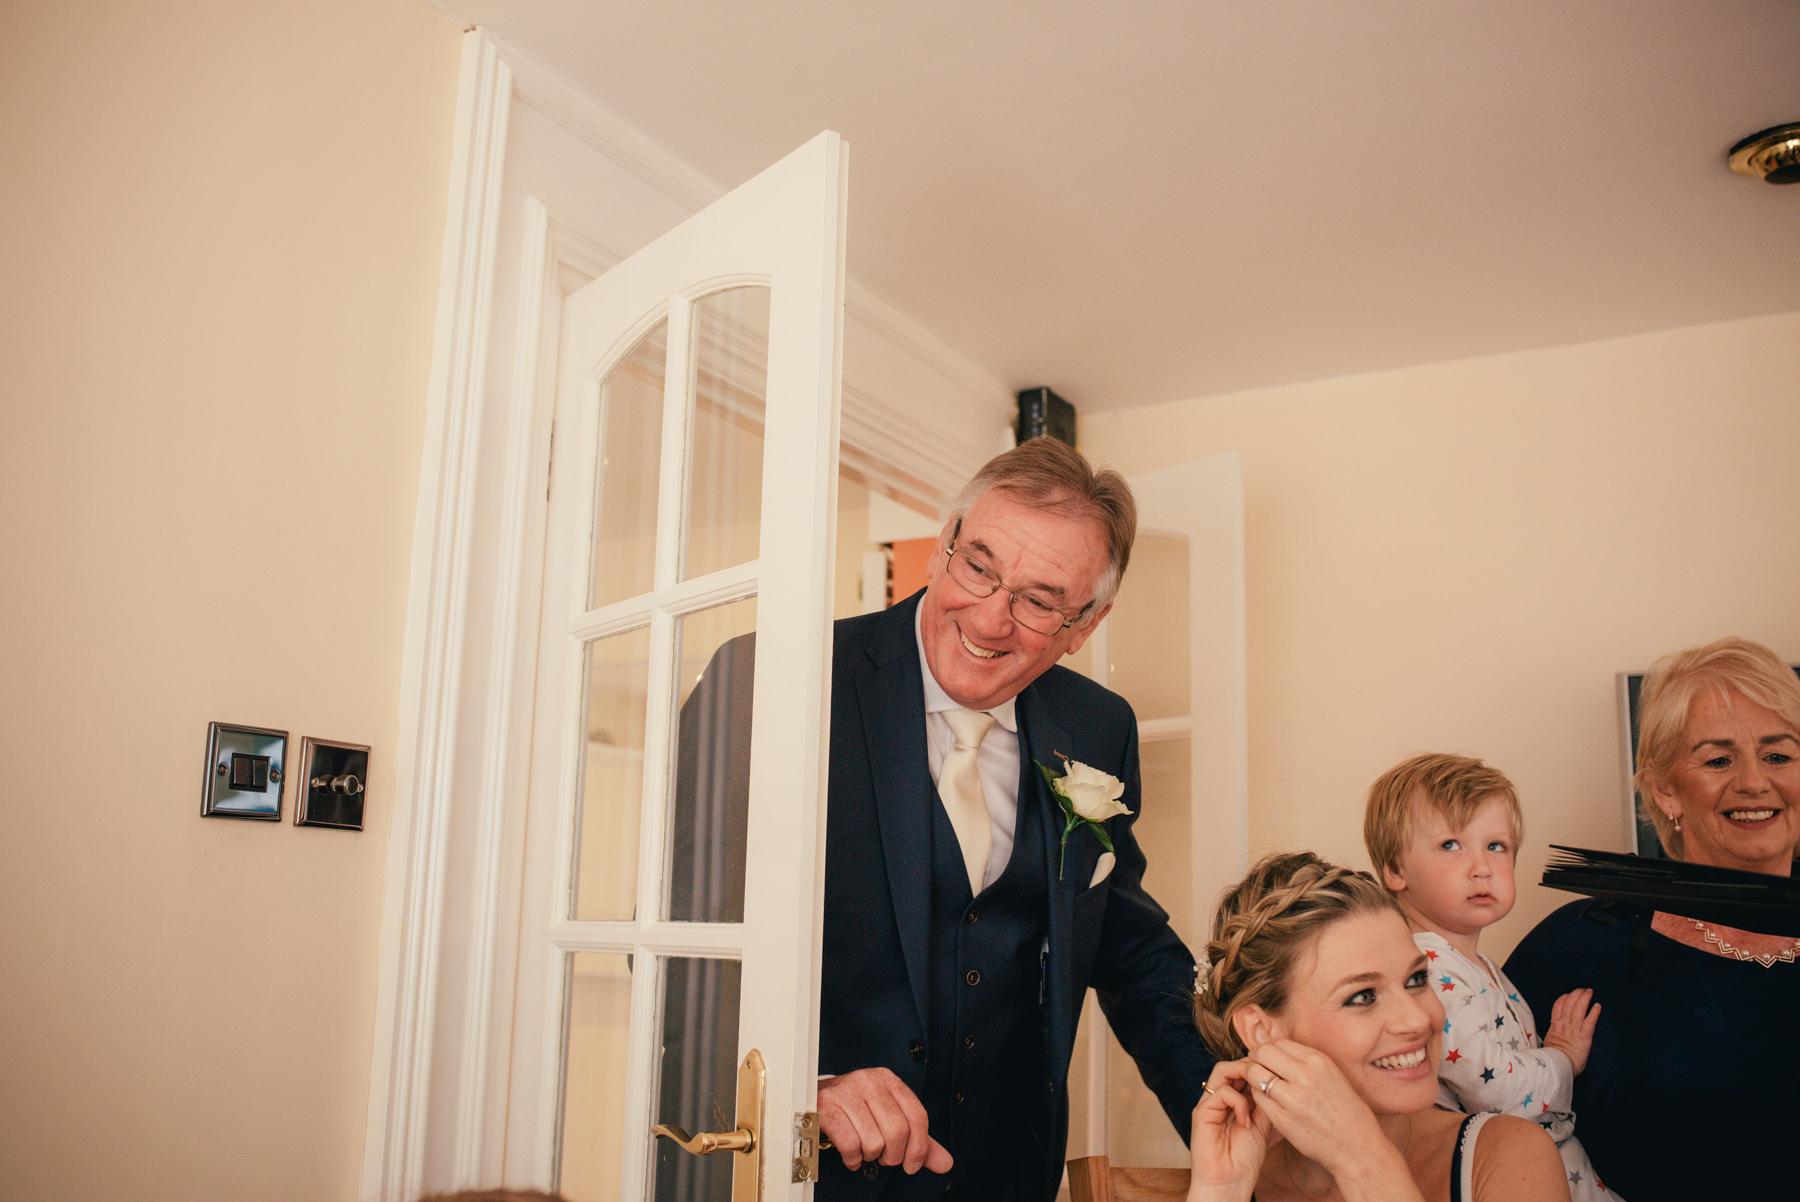 liverpool-wedding-photographer-10